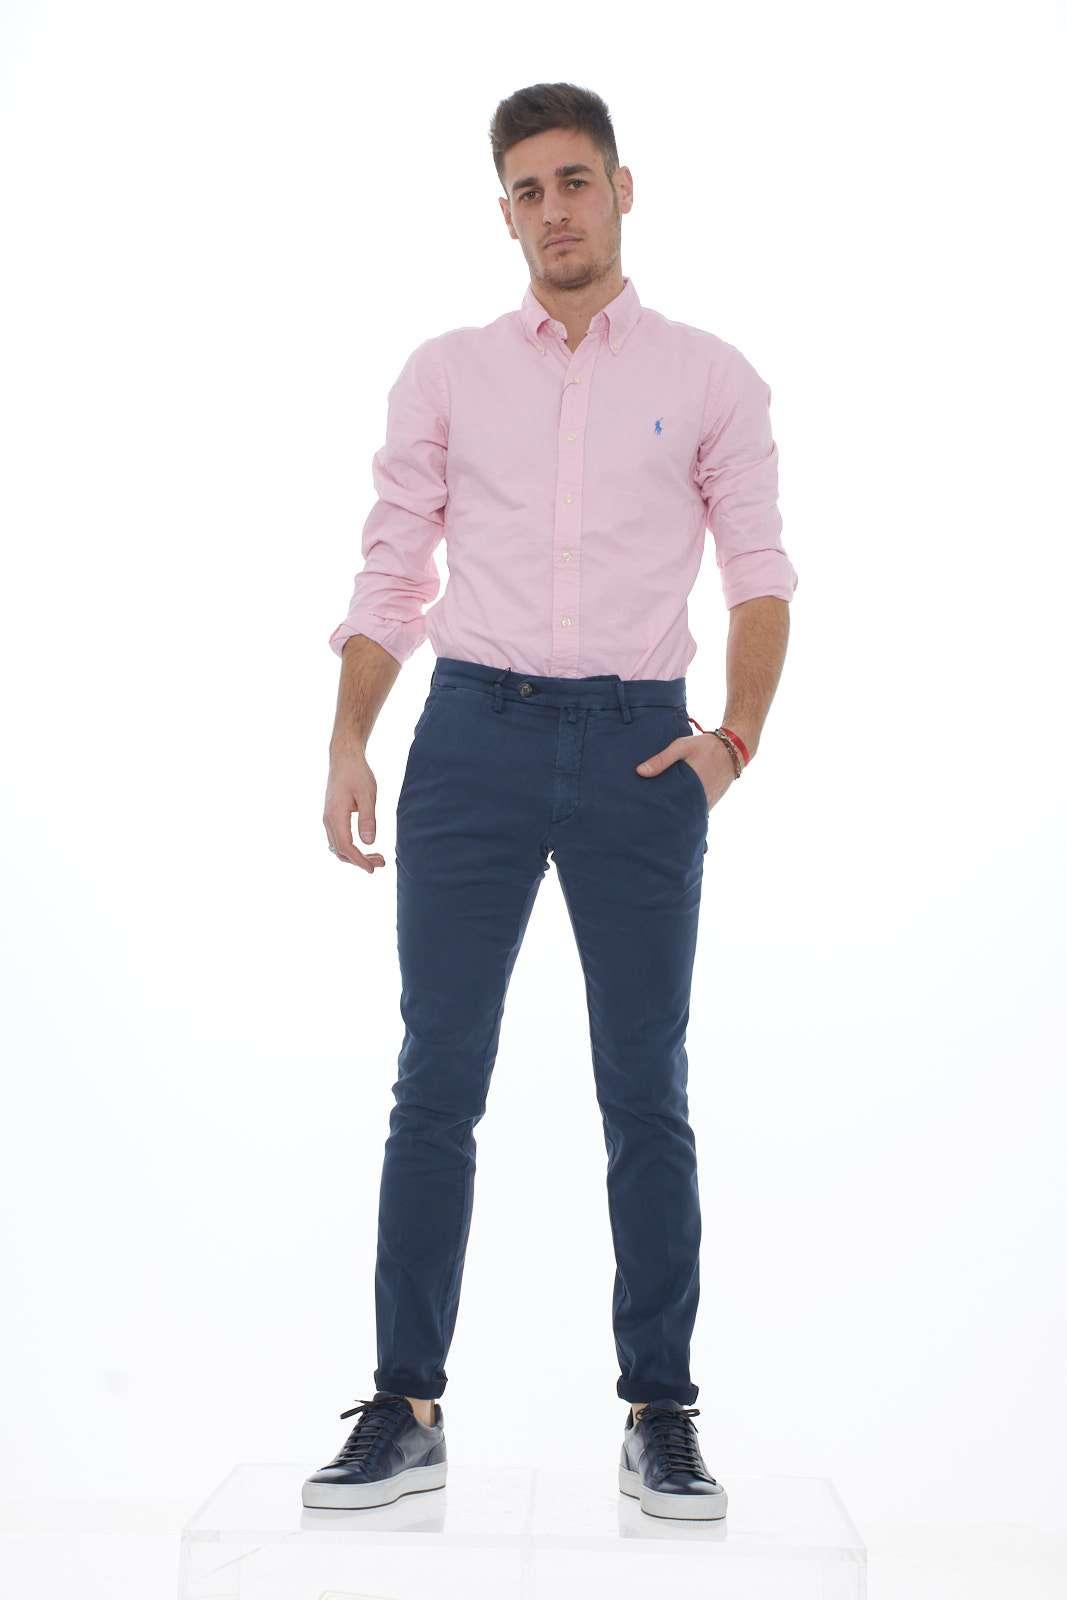 https://www.parmax.com/media/catalog/product/a/i/PE-outlet_parmax-pantalonoe-uomo-Michael-Coal-RICKY3360L-D.jpg